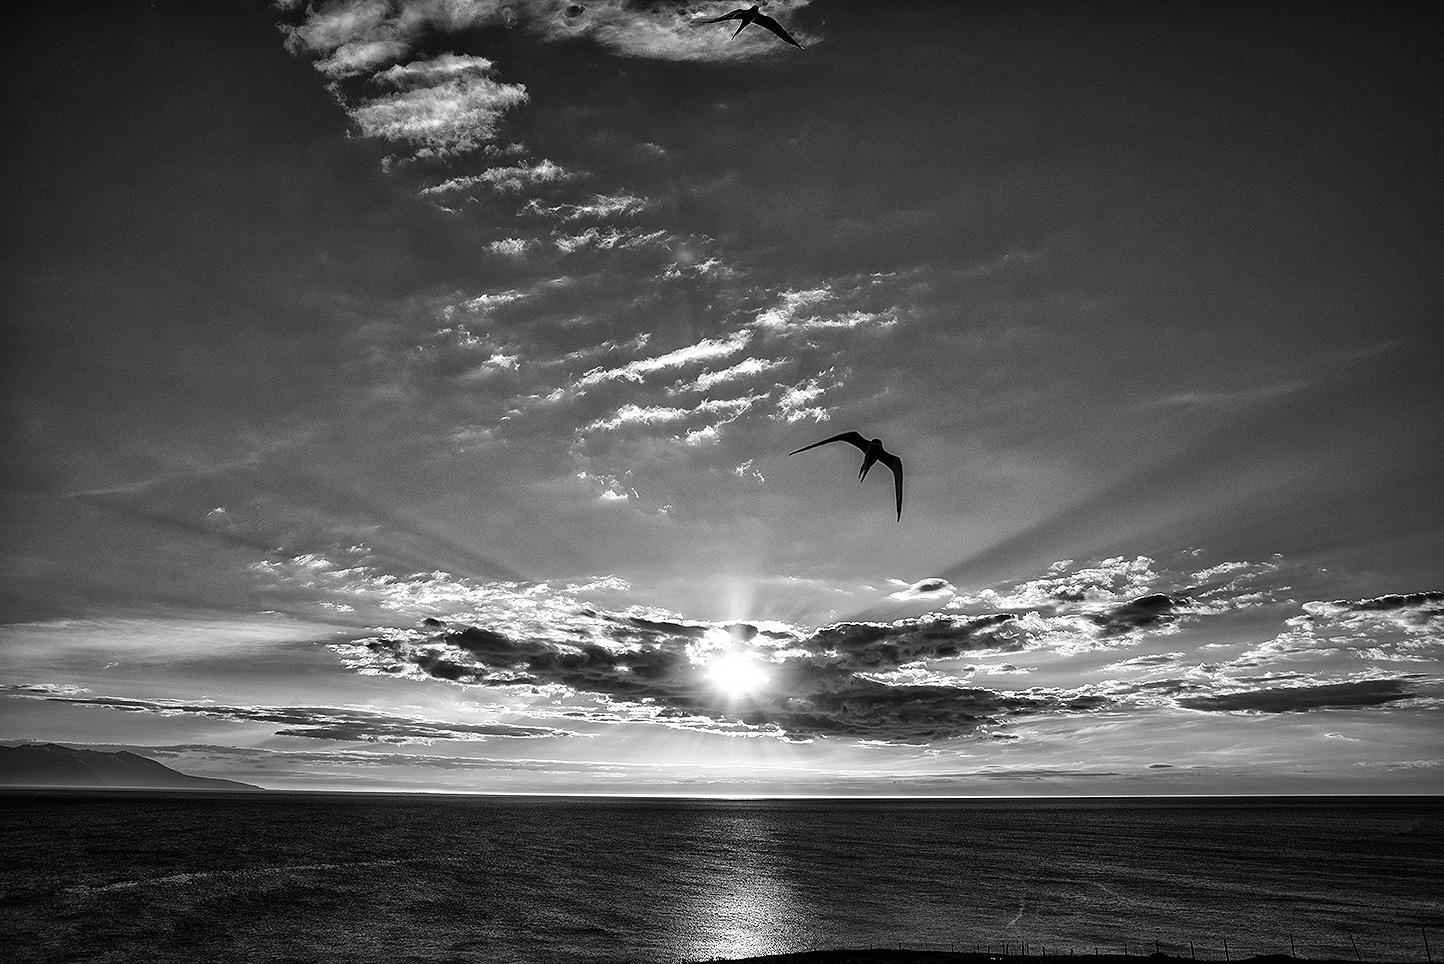 tramonto-sterna-artica-web